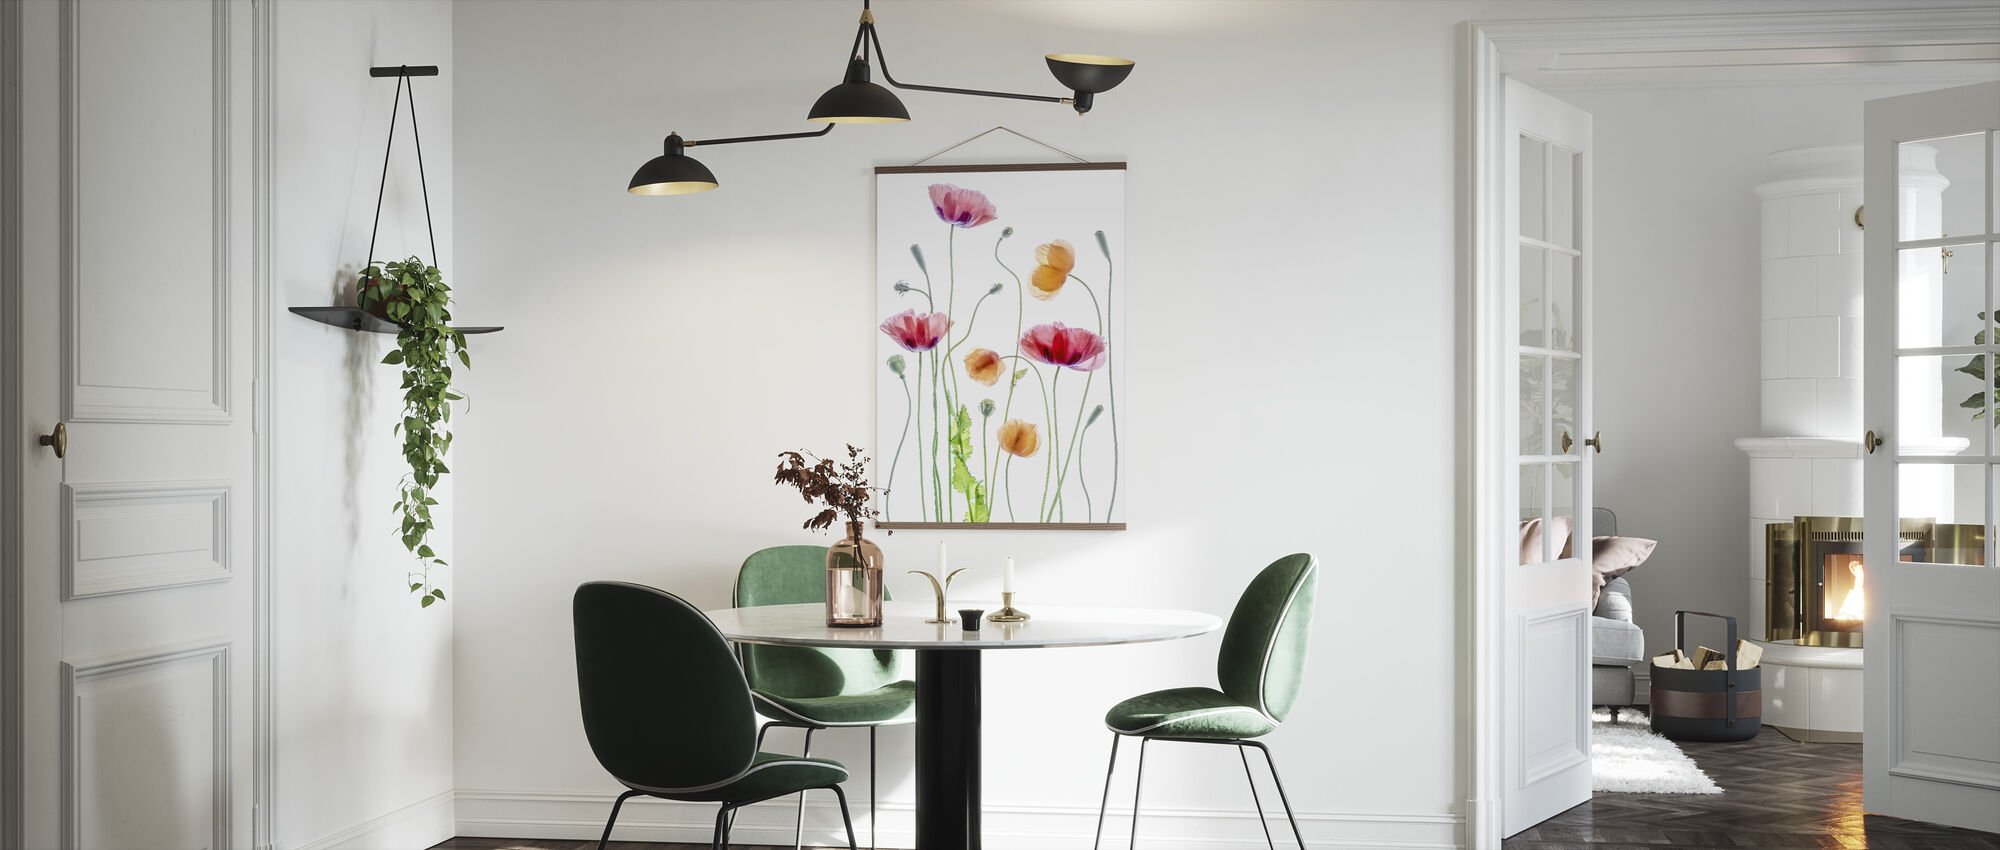 Poppies - Poster - Kitchen